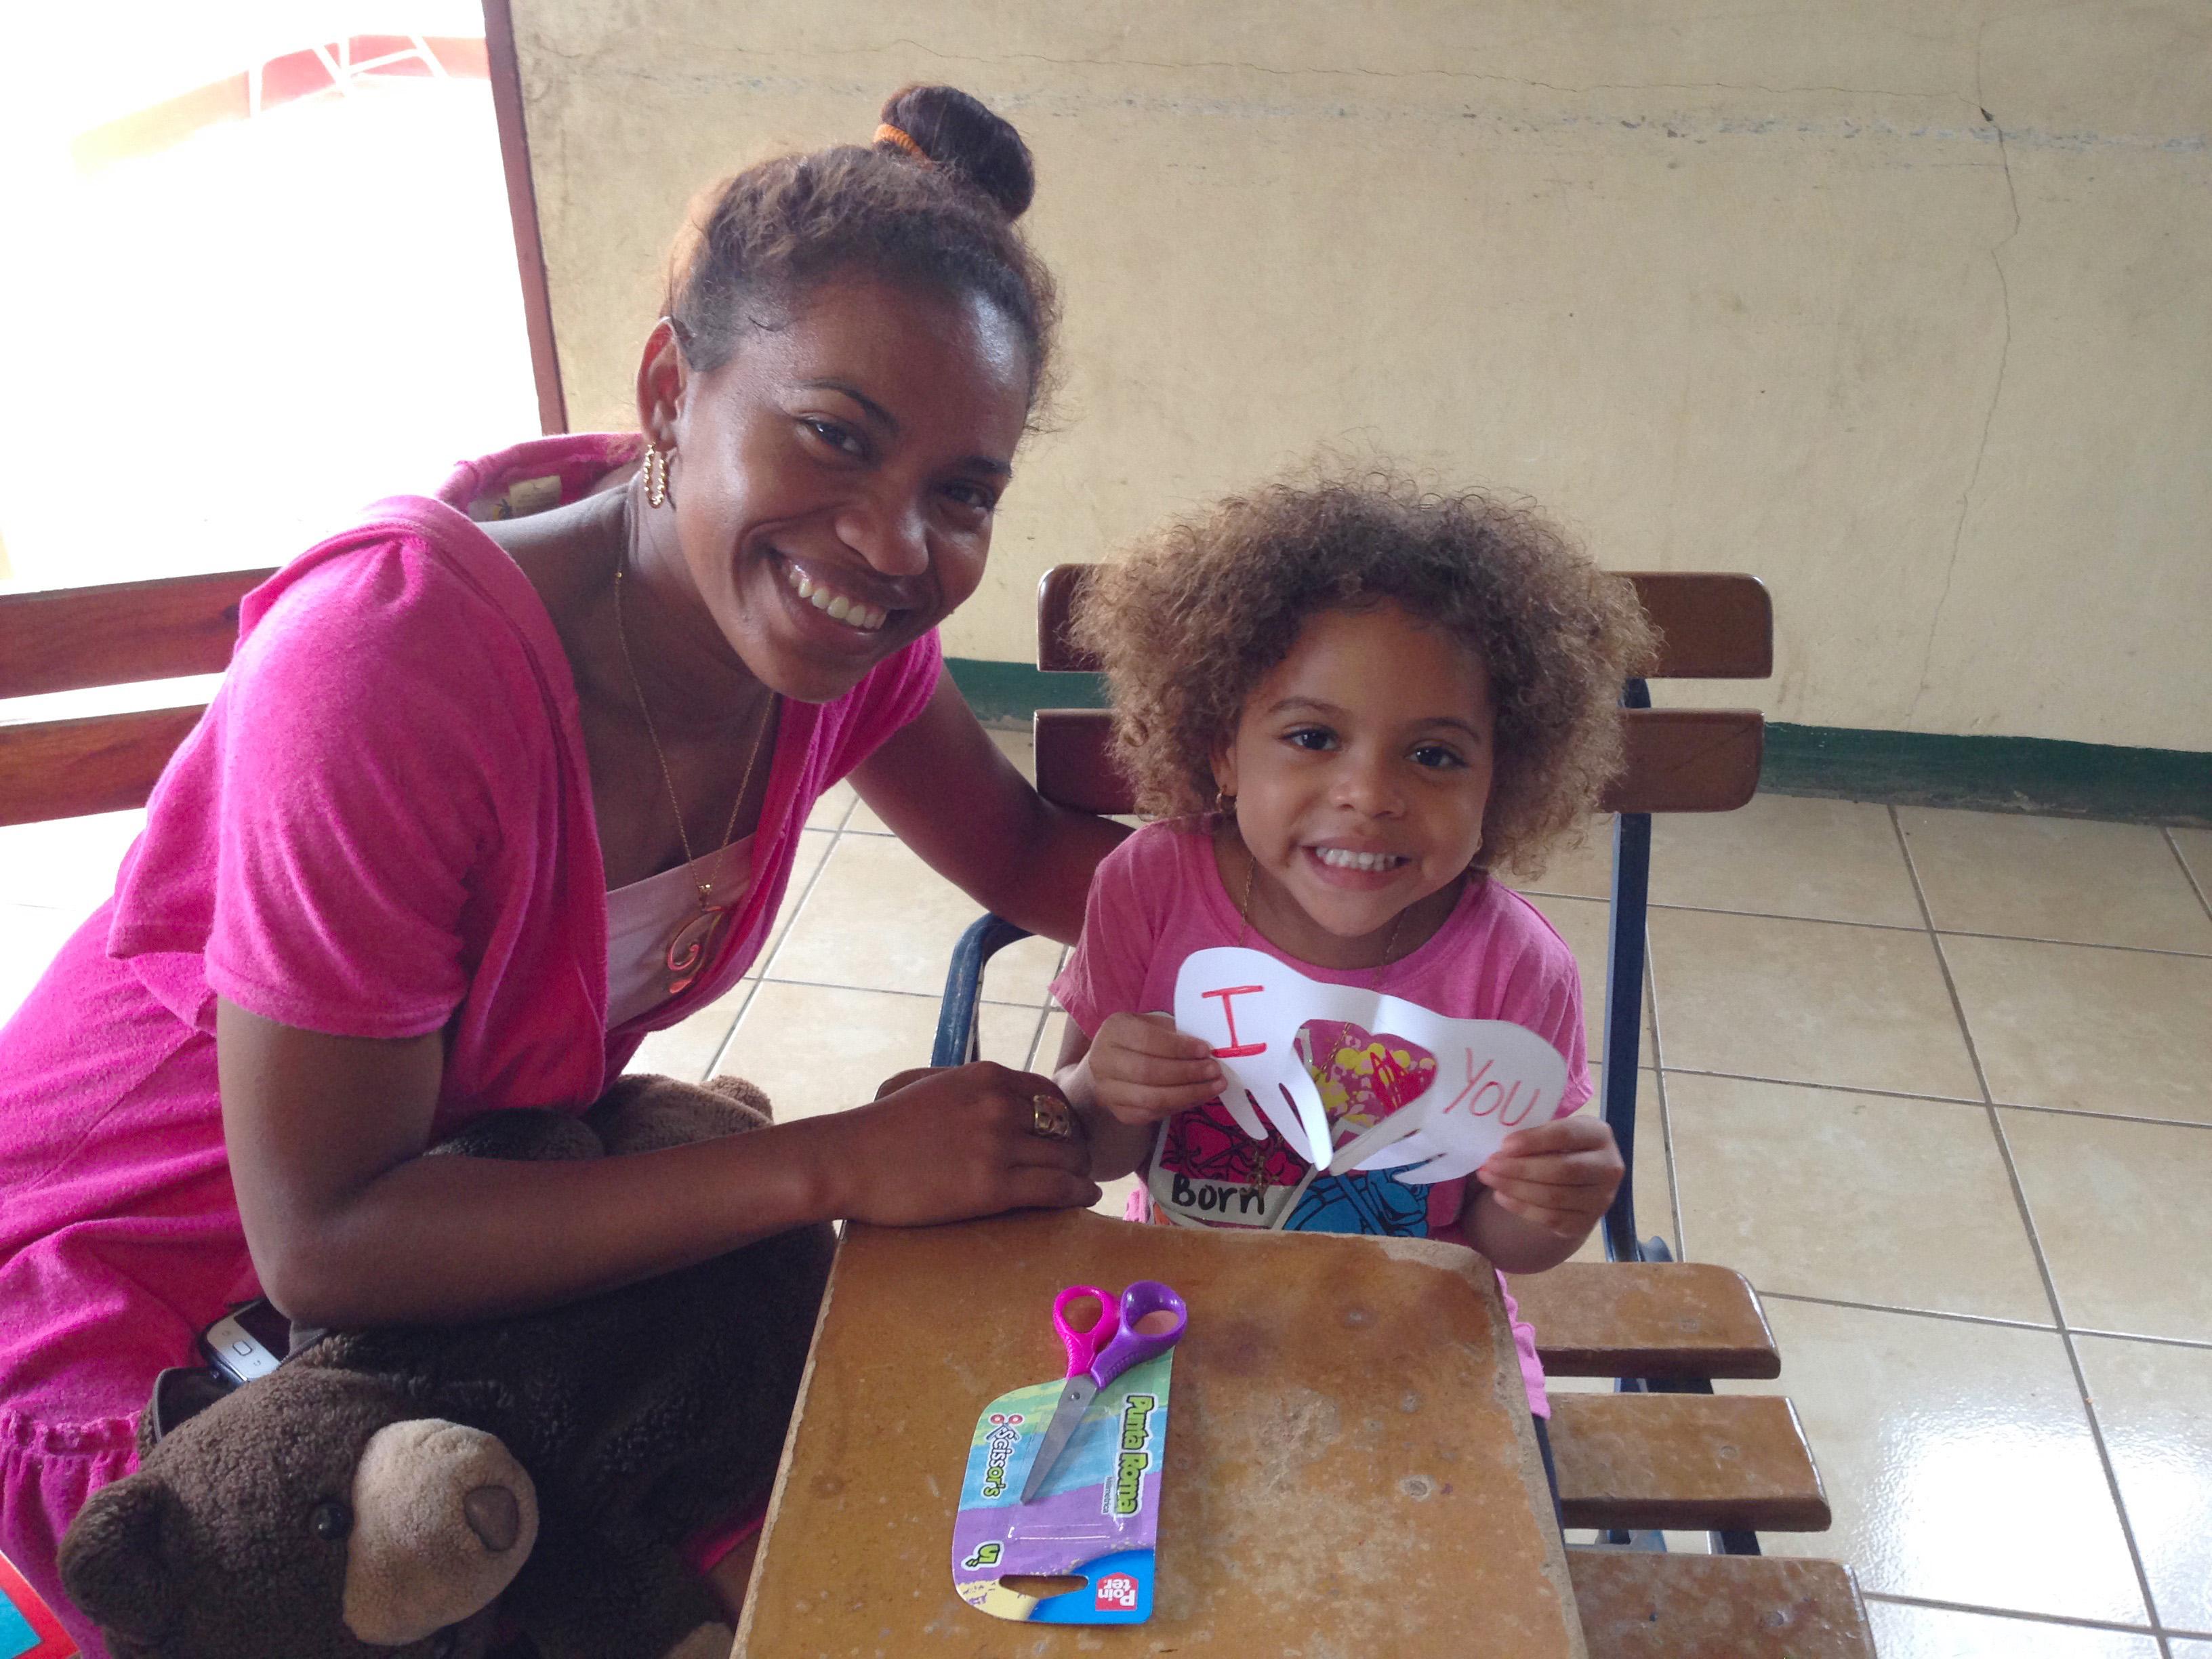 Nicaragua_2017_Jeanette_Salley_04.jpg